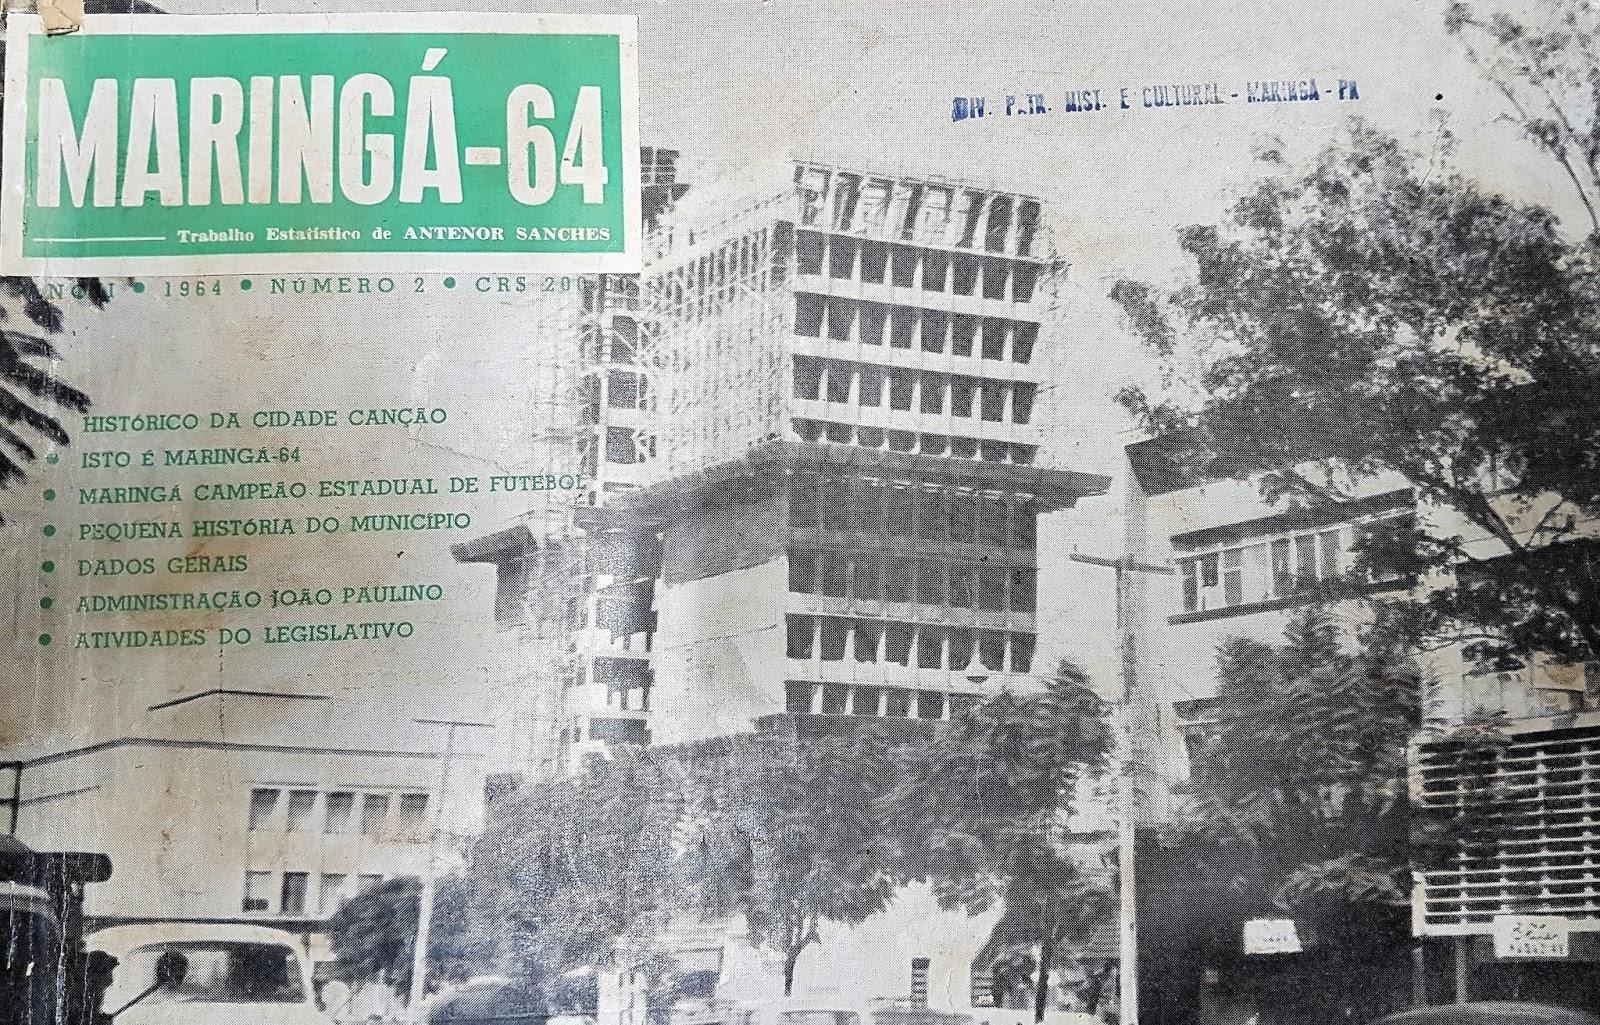 Avenida Getúlio Vargas - 1964